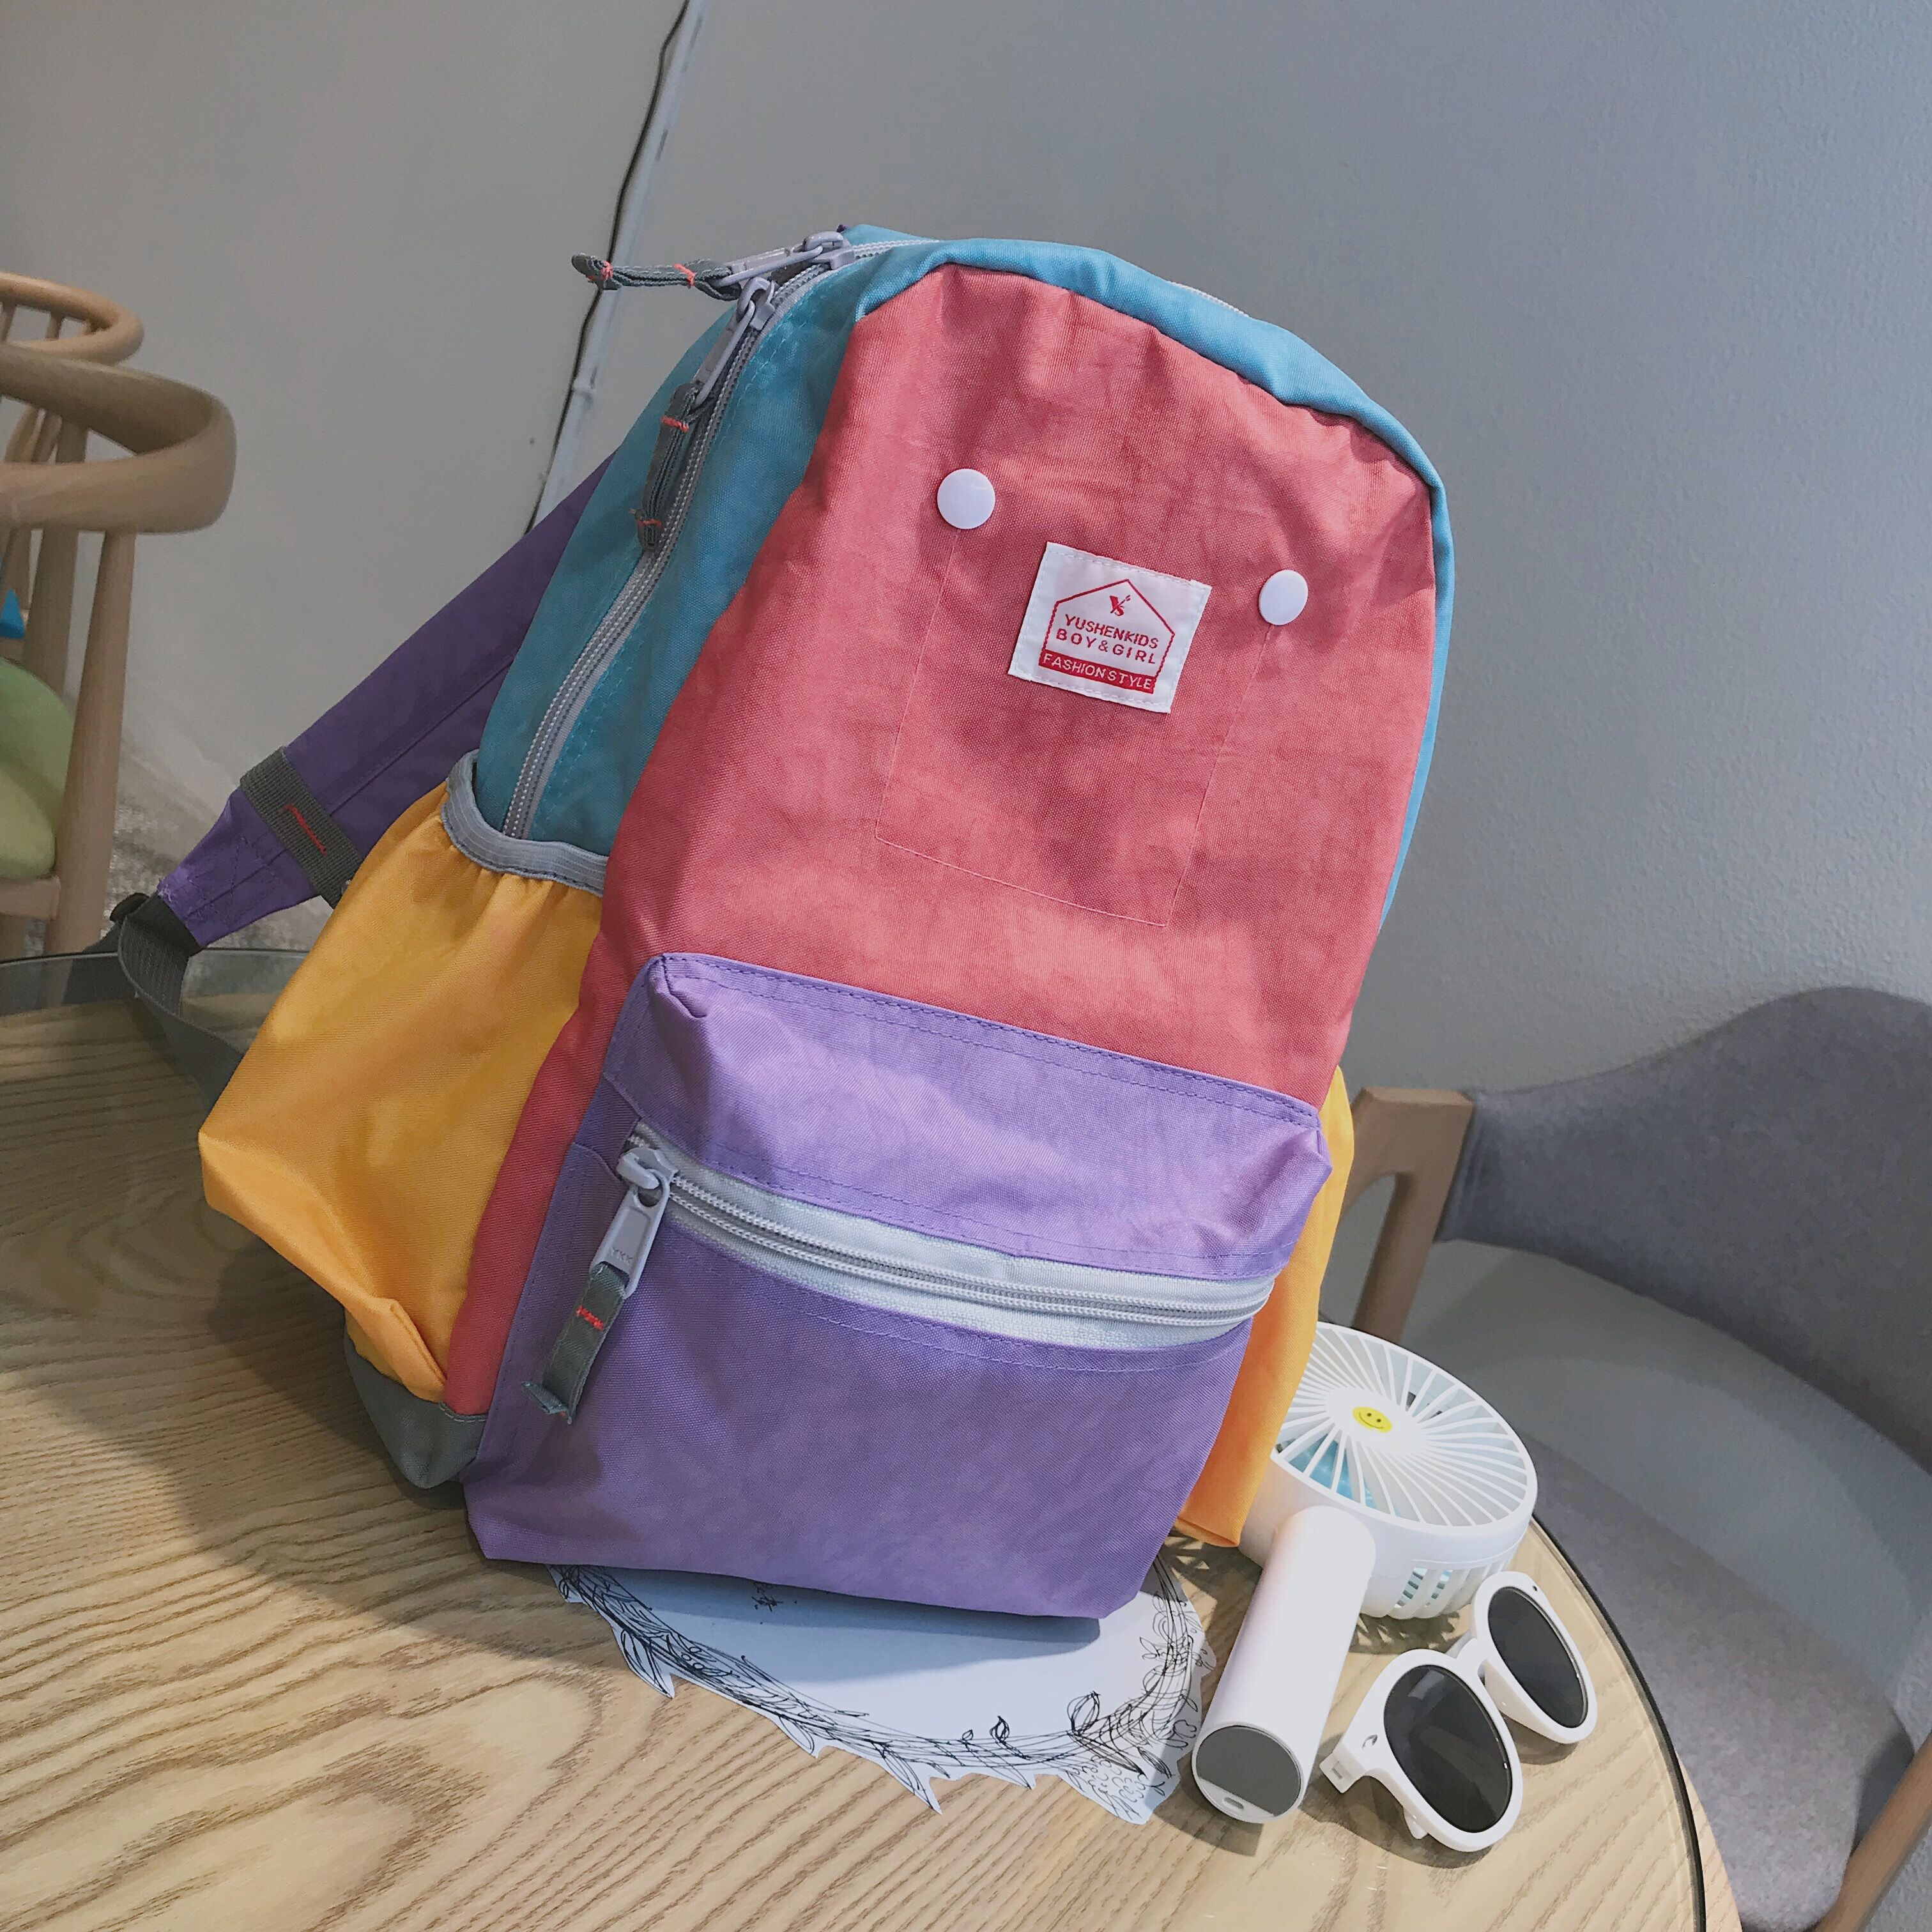 YUSHEN儿童背包潮双肩包外出旅游轻便男孩女孩韩版防水幼儿园书包限1000张券